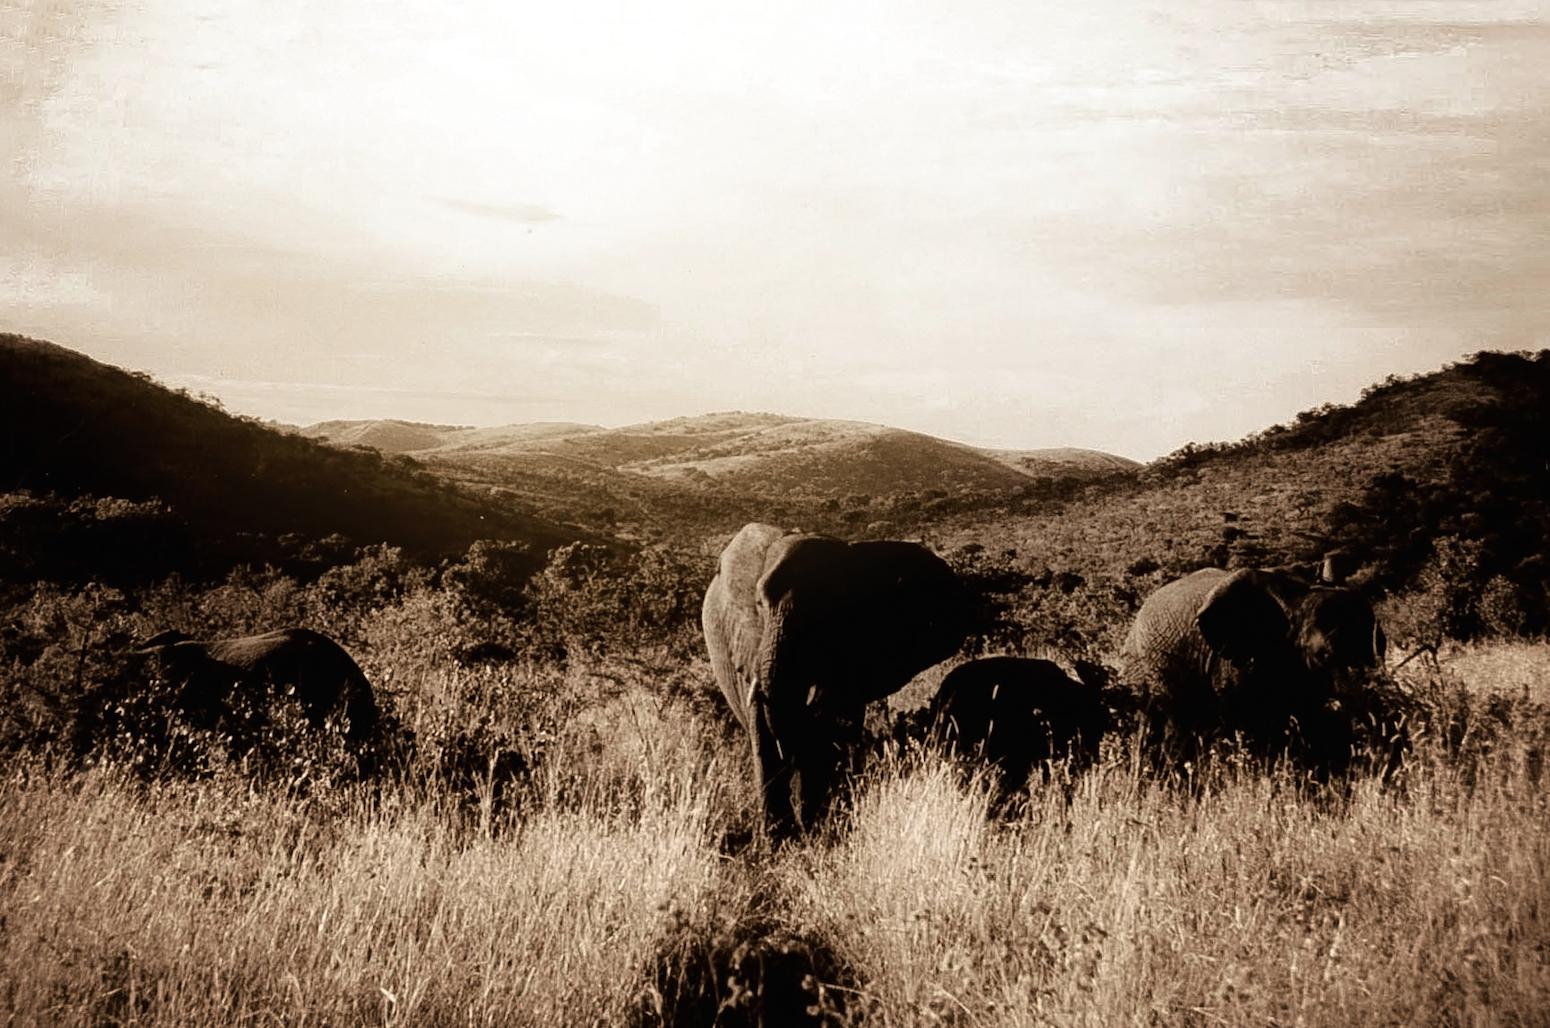 Elephants Grazing S. Africa